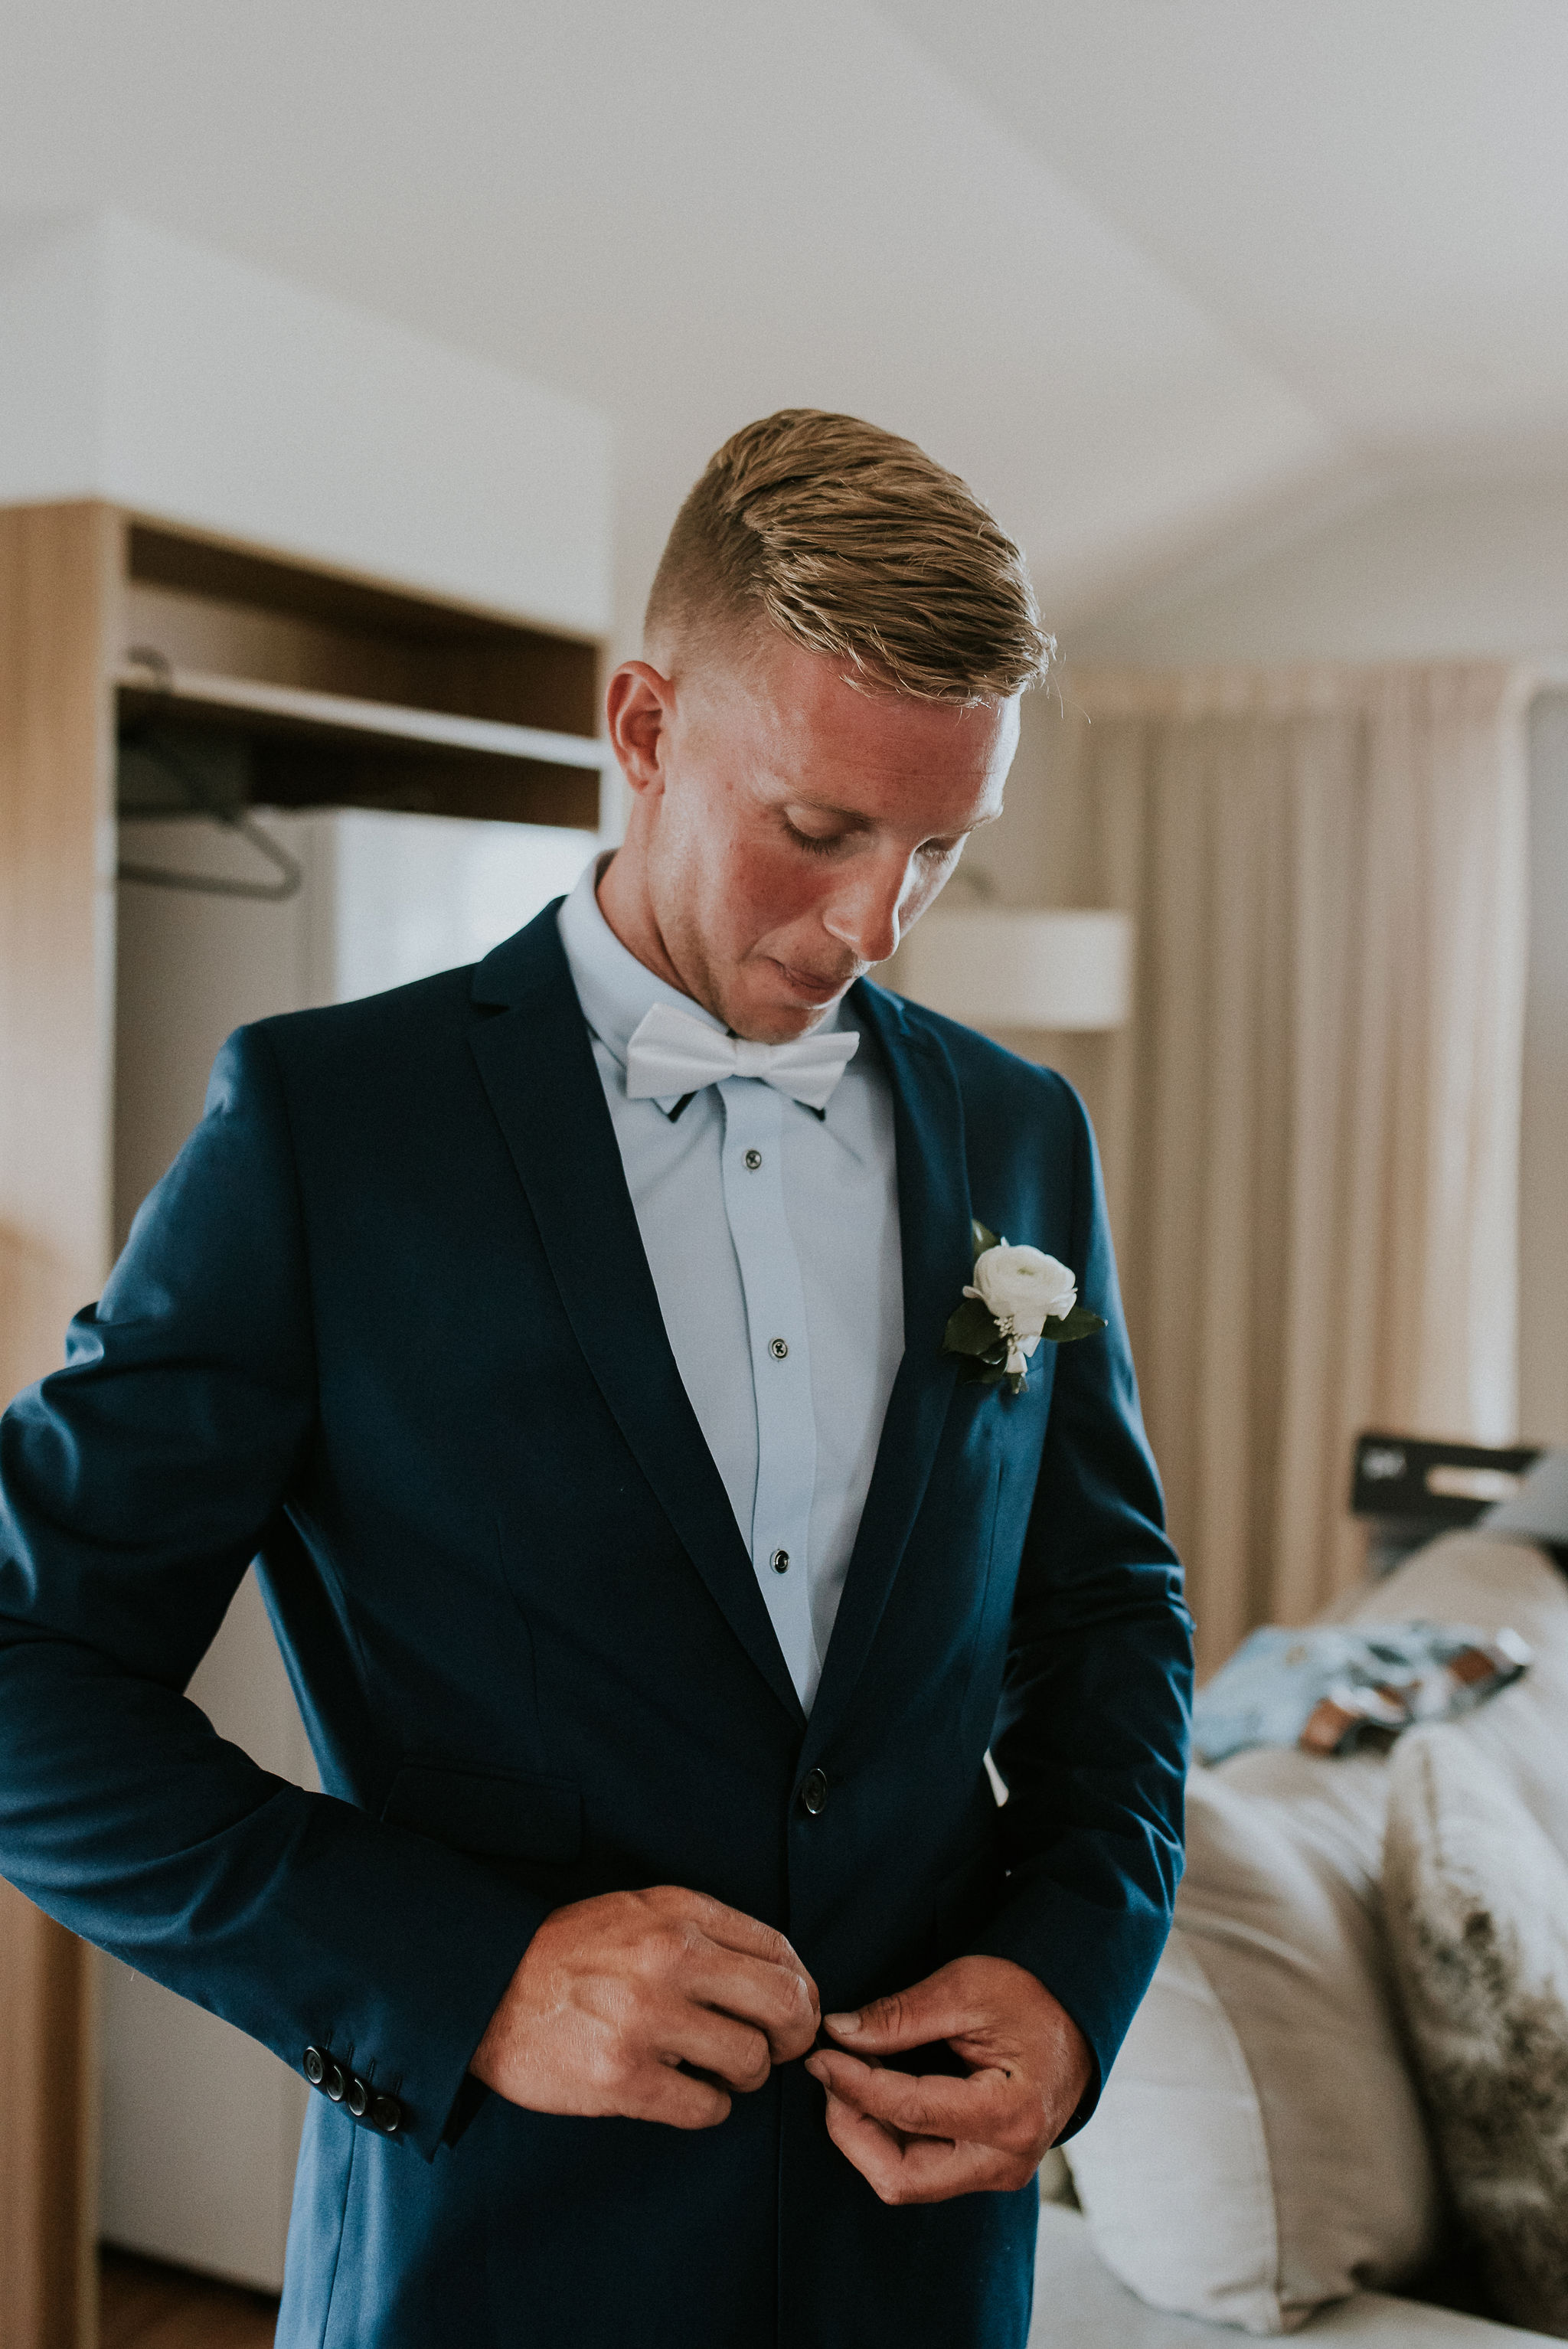 CAVES-BEACH-HOTEL-WEDDING-PATTEN-242.jpg